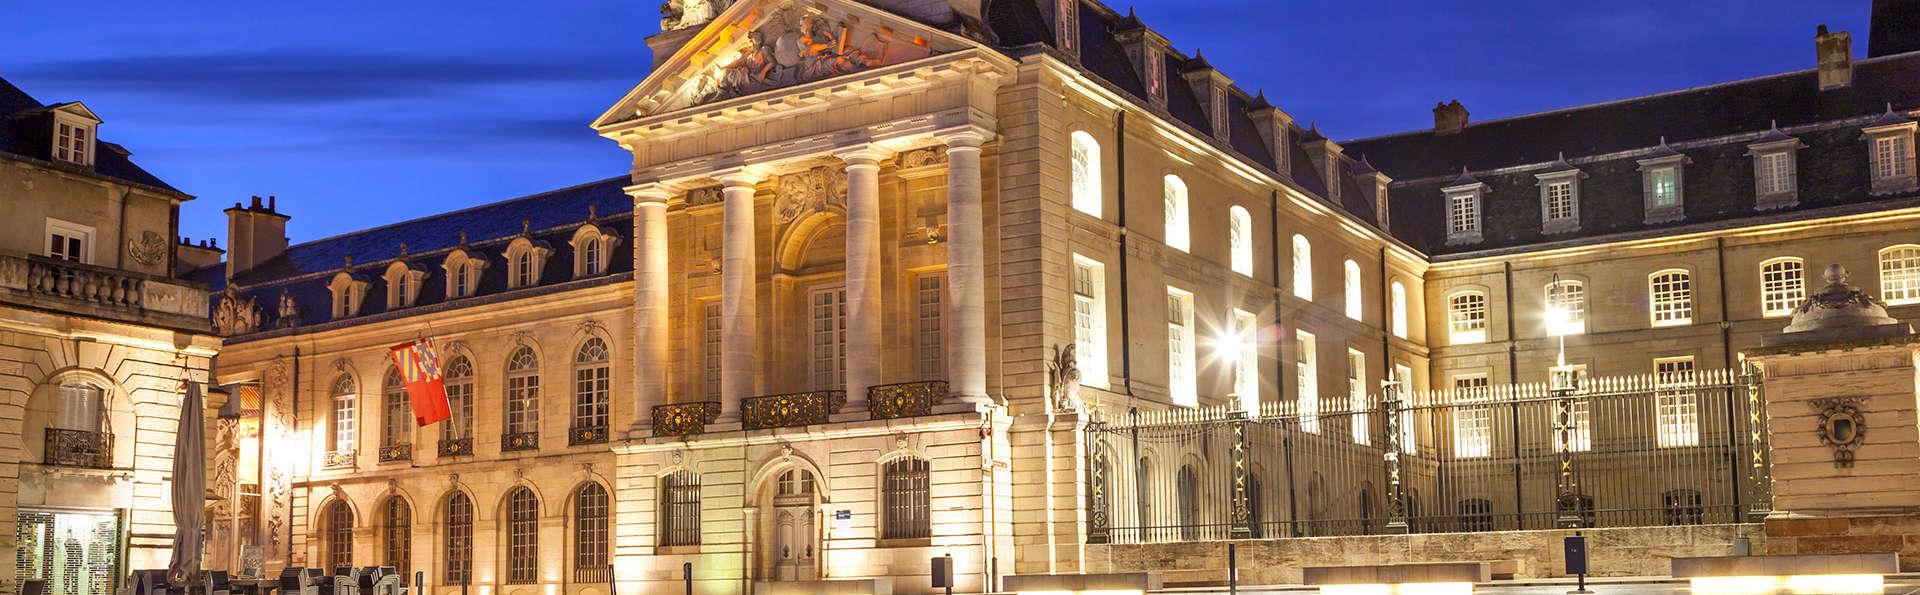 Maison Philippe Le Bon - Dijon - Edit_Dijon2.jpg